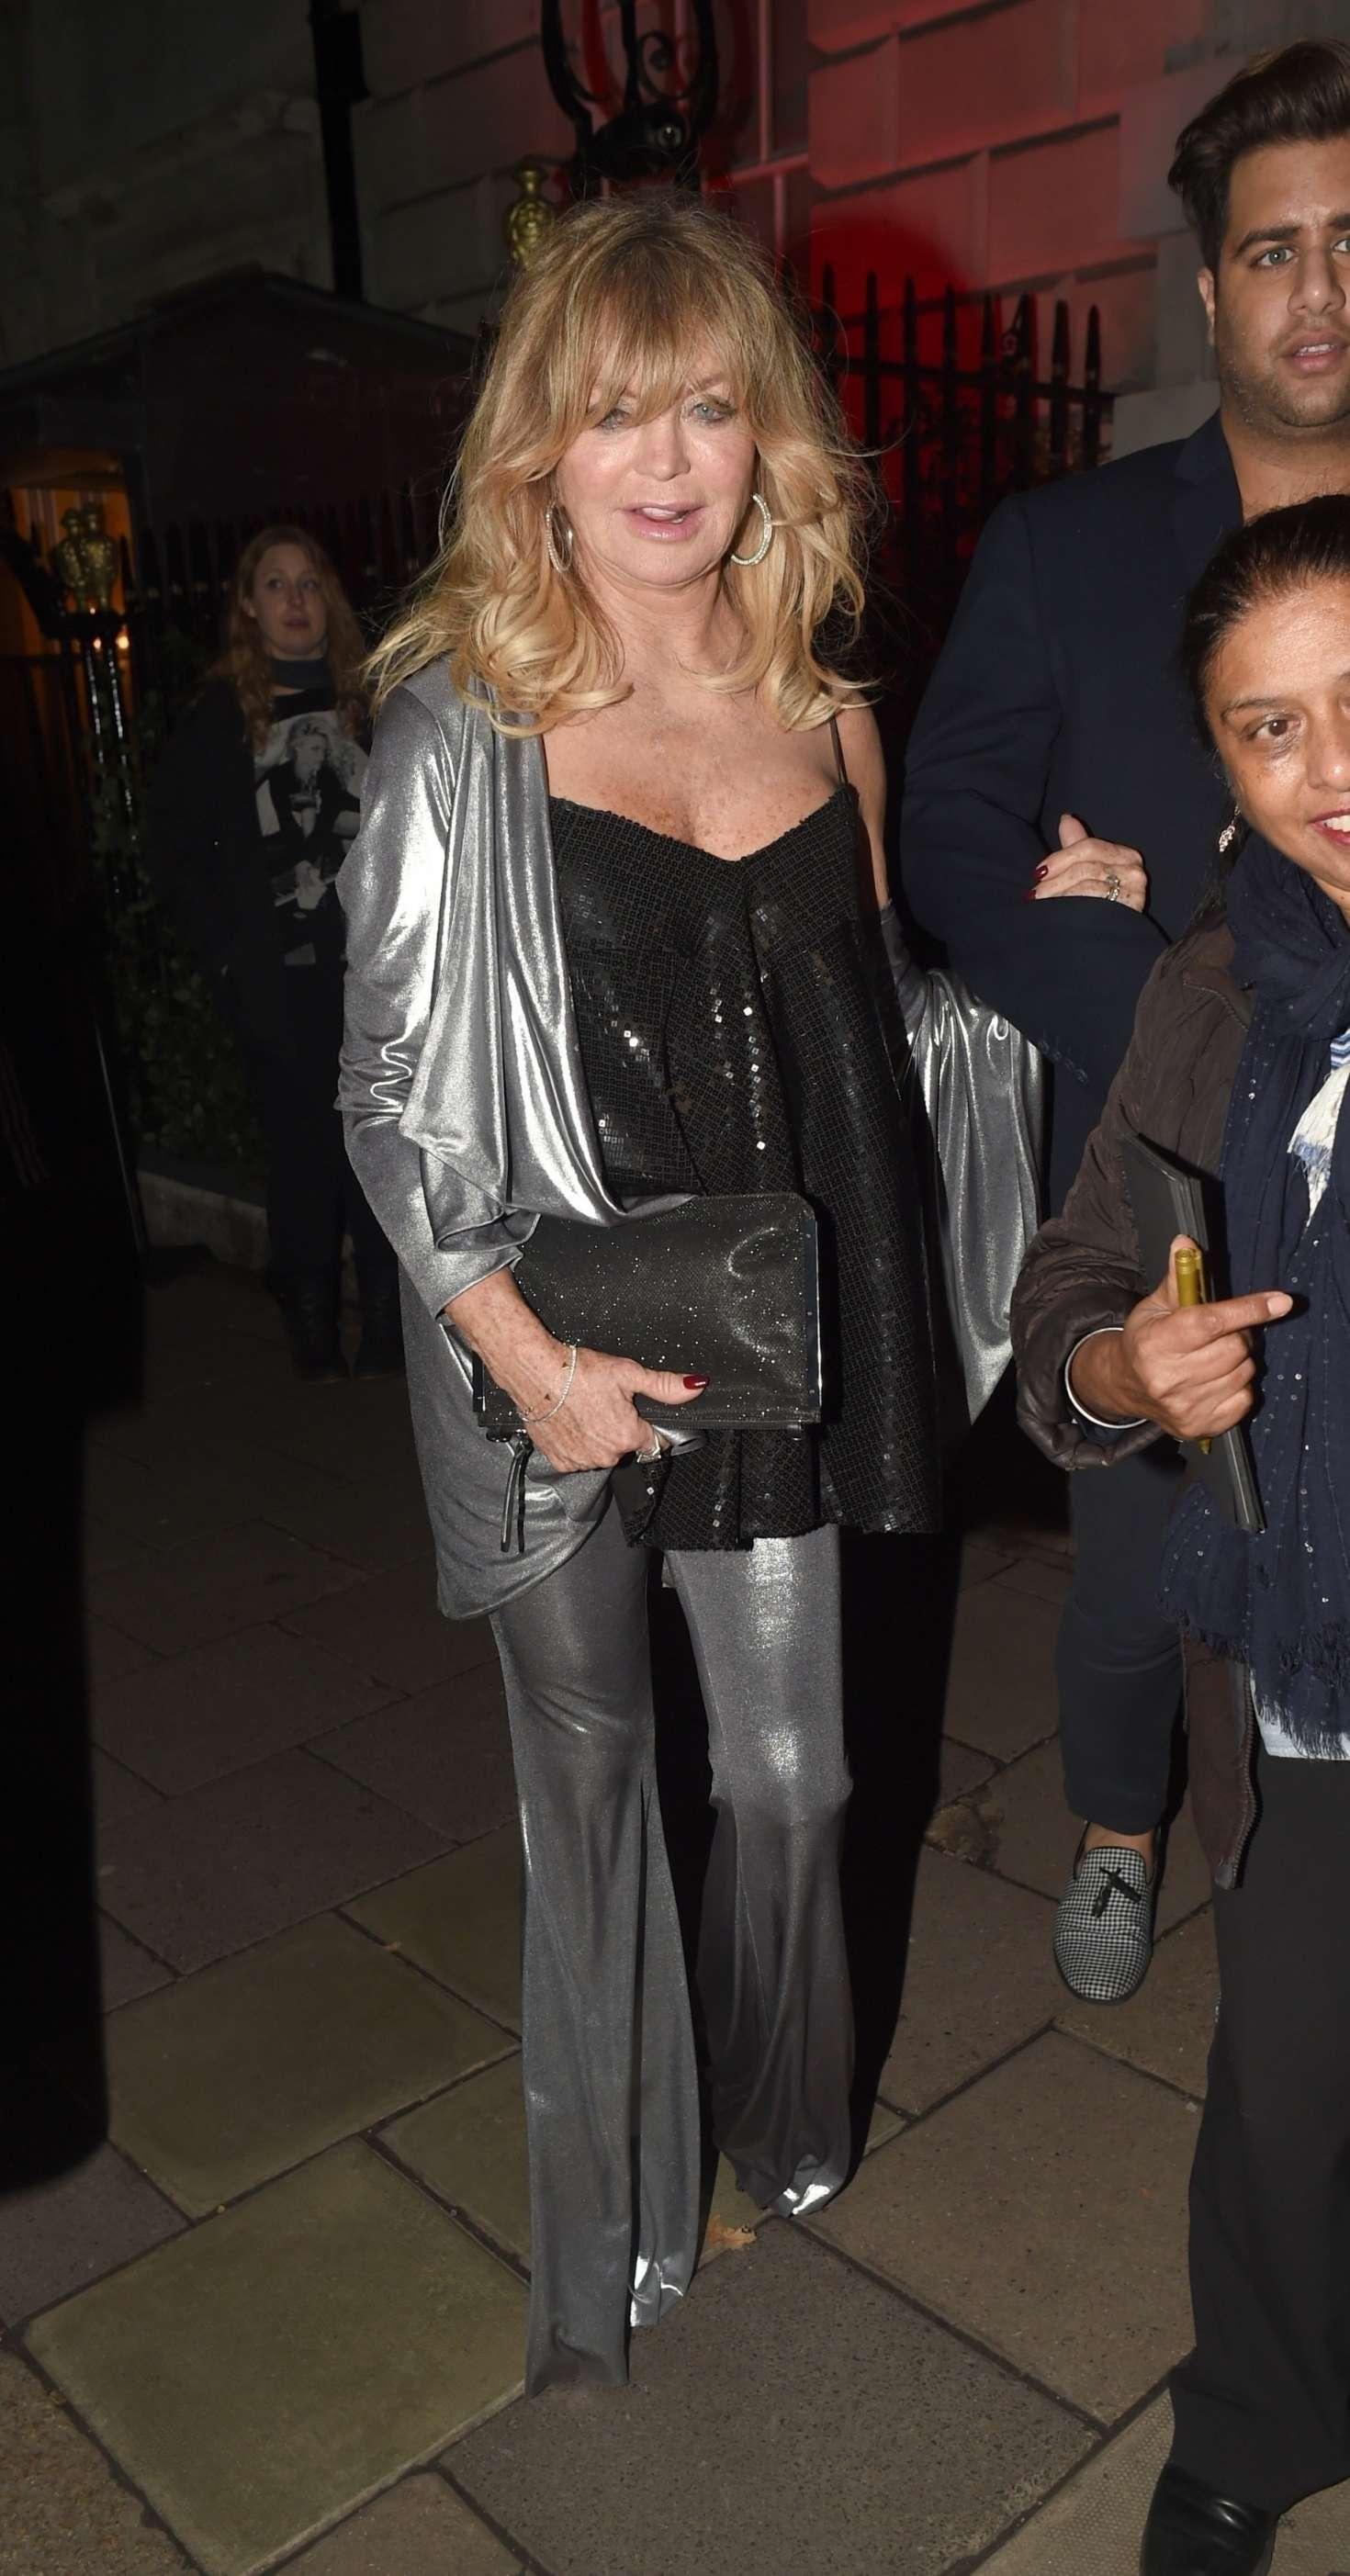 Goldie Hawn 2018 : Goldie Hawn: Goldies Love in Charity Fundraiser -09